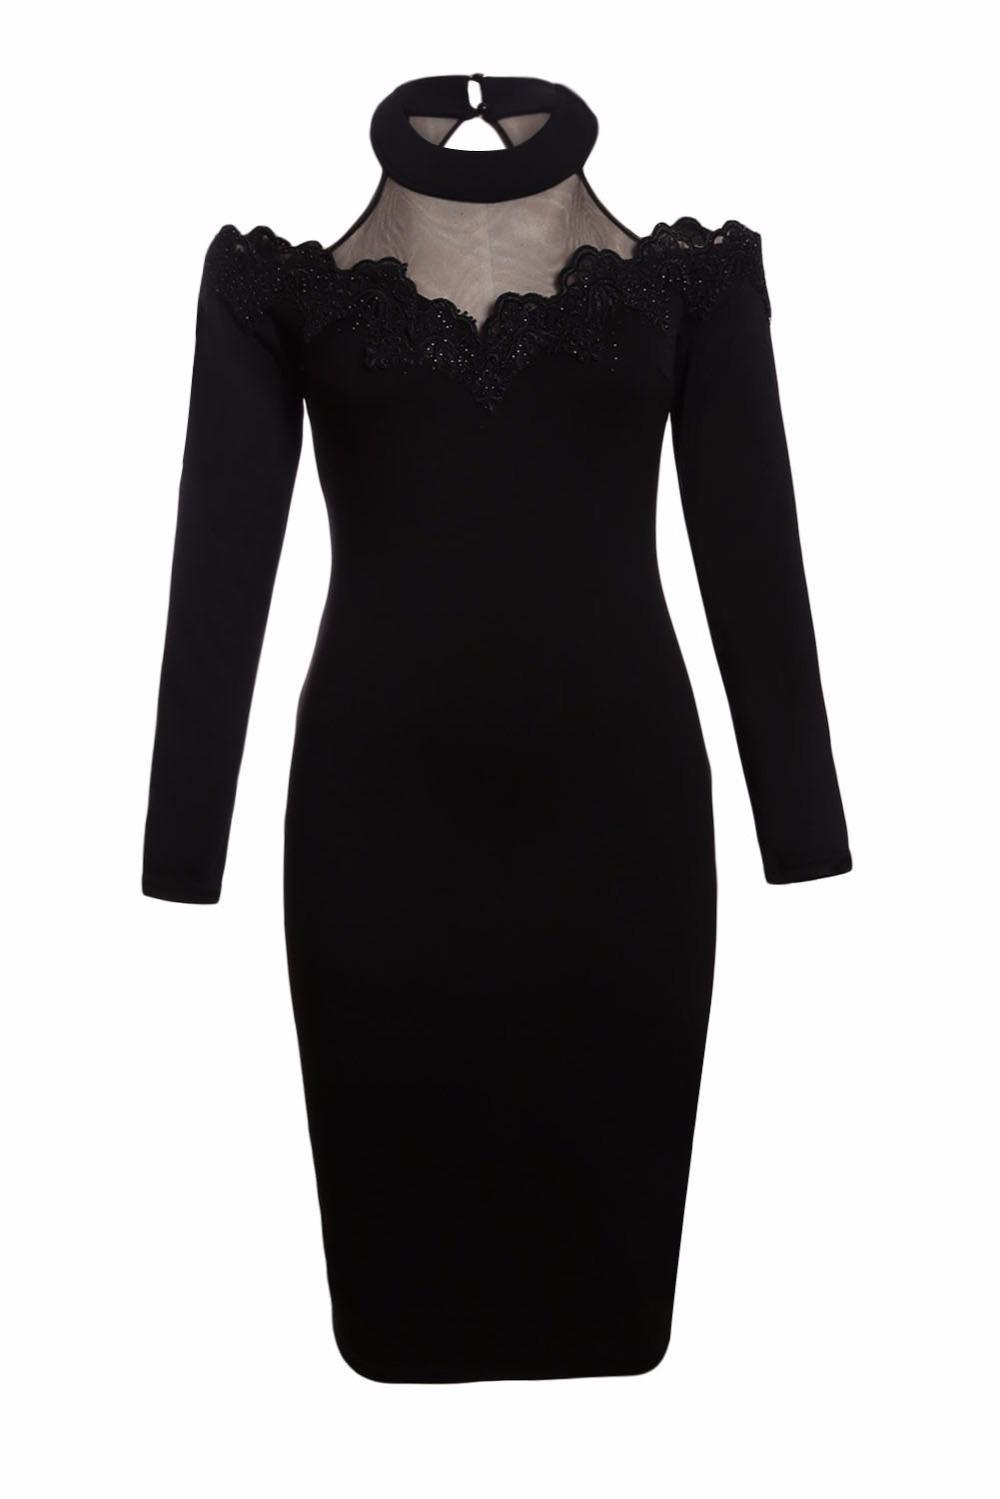 ce296ac3f Vestido de Fiesta de Manga Larga de Las Mujeres Elegante Negro Crochet  Applique Malla Insertar Hollow Out Cold Hombro Midi Vestido Lc61894